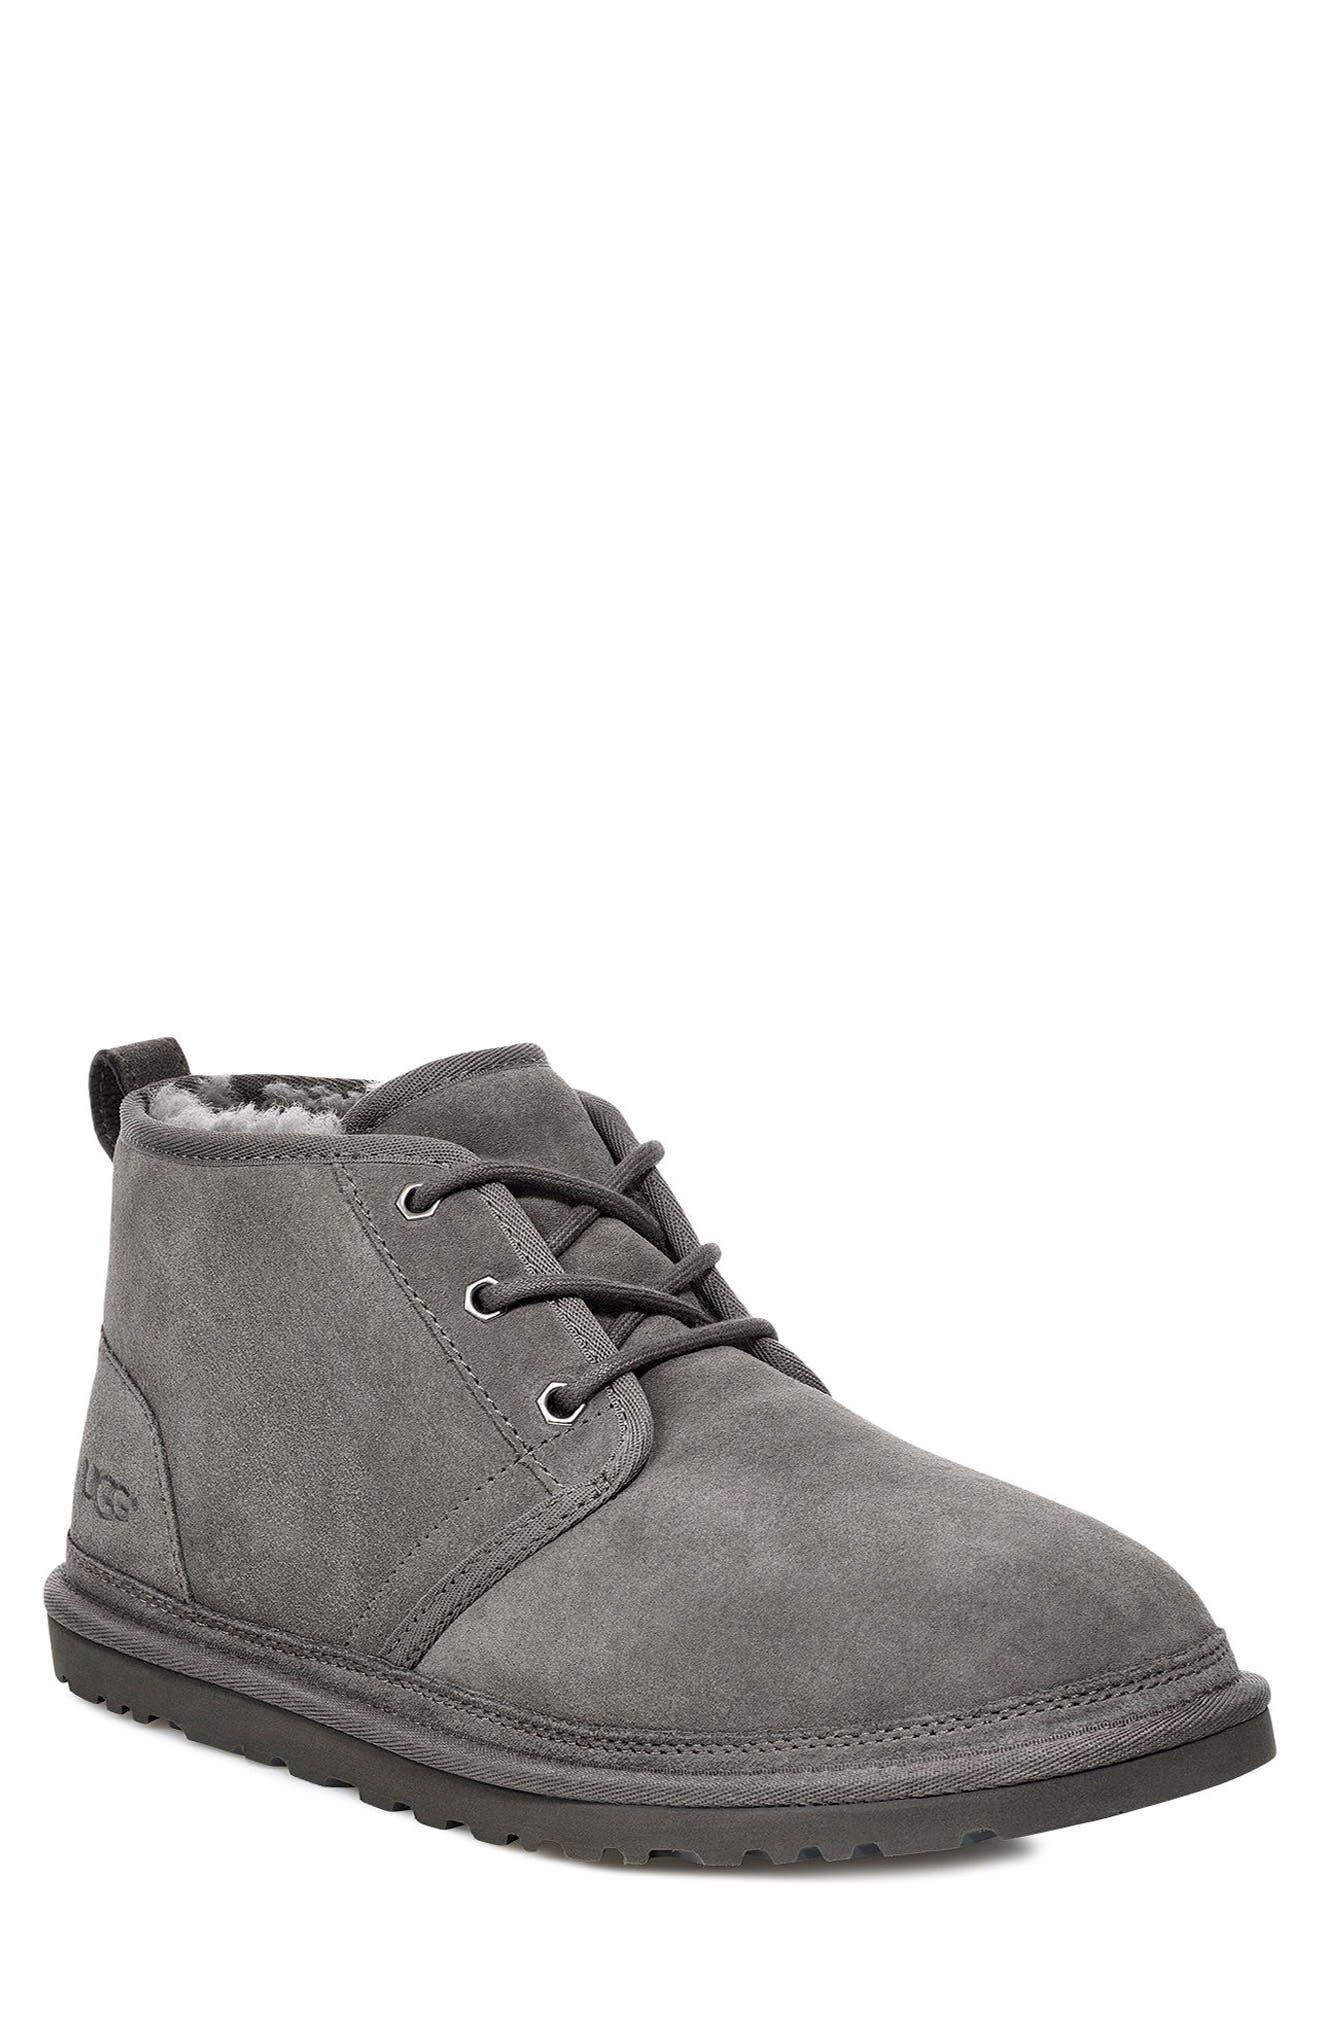 Ugg Neumel Chukka Boot, Grey